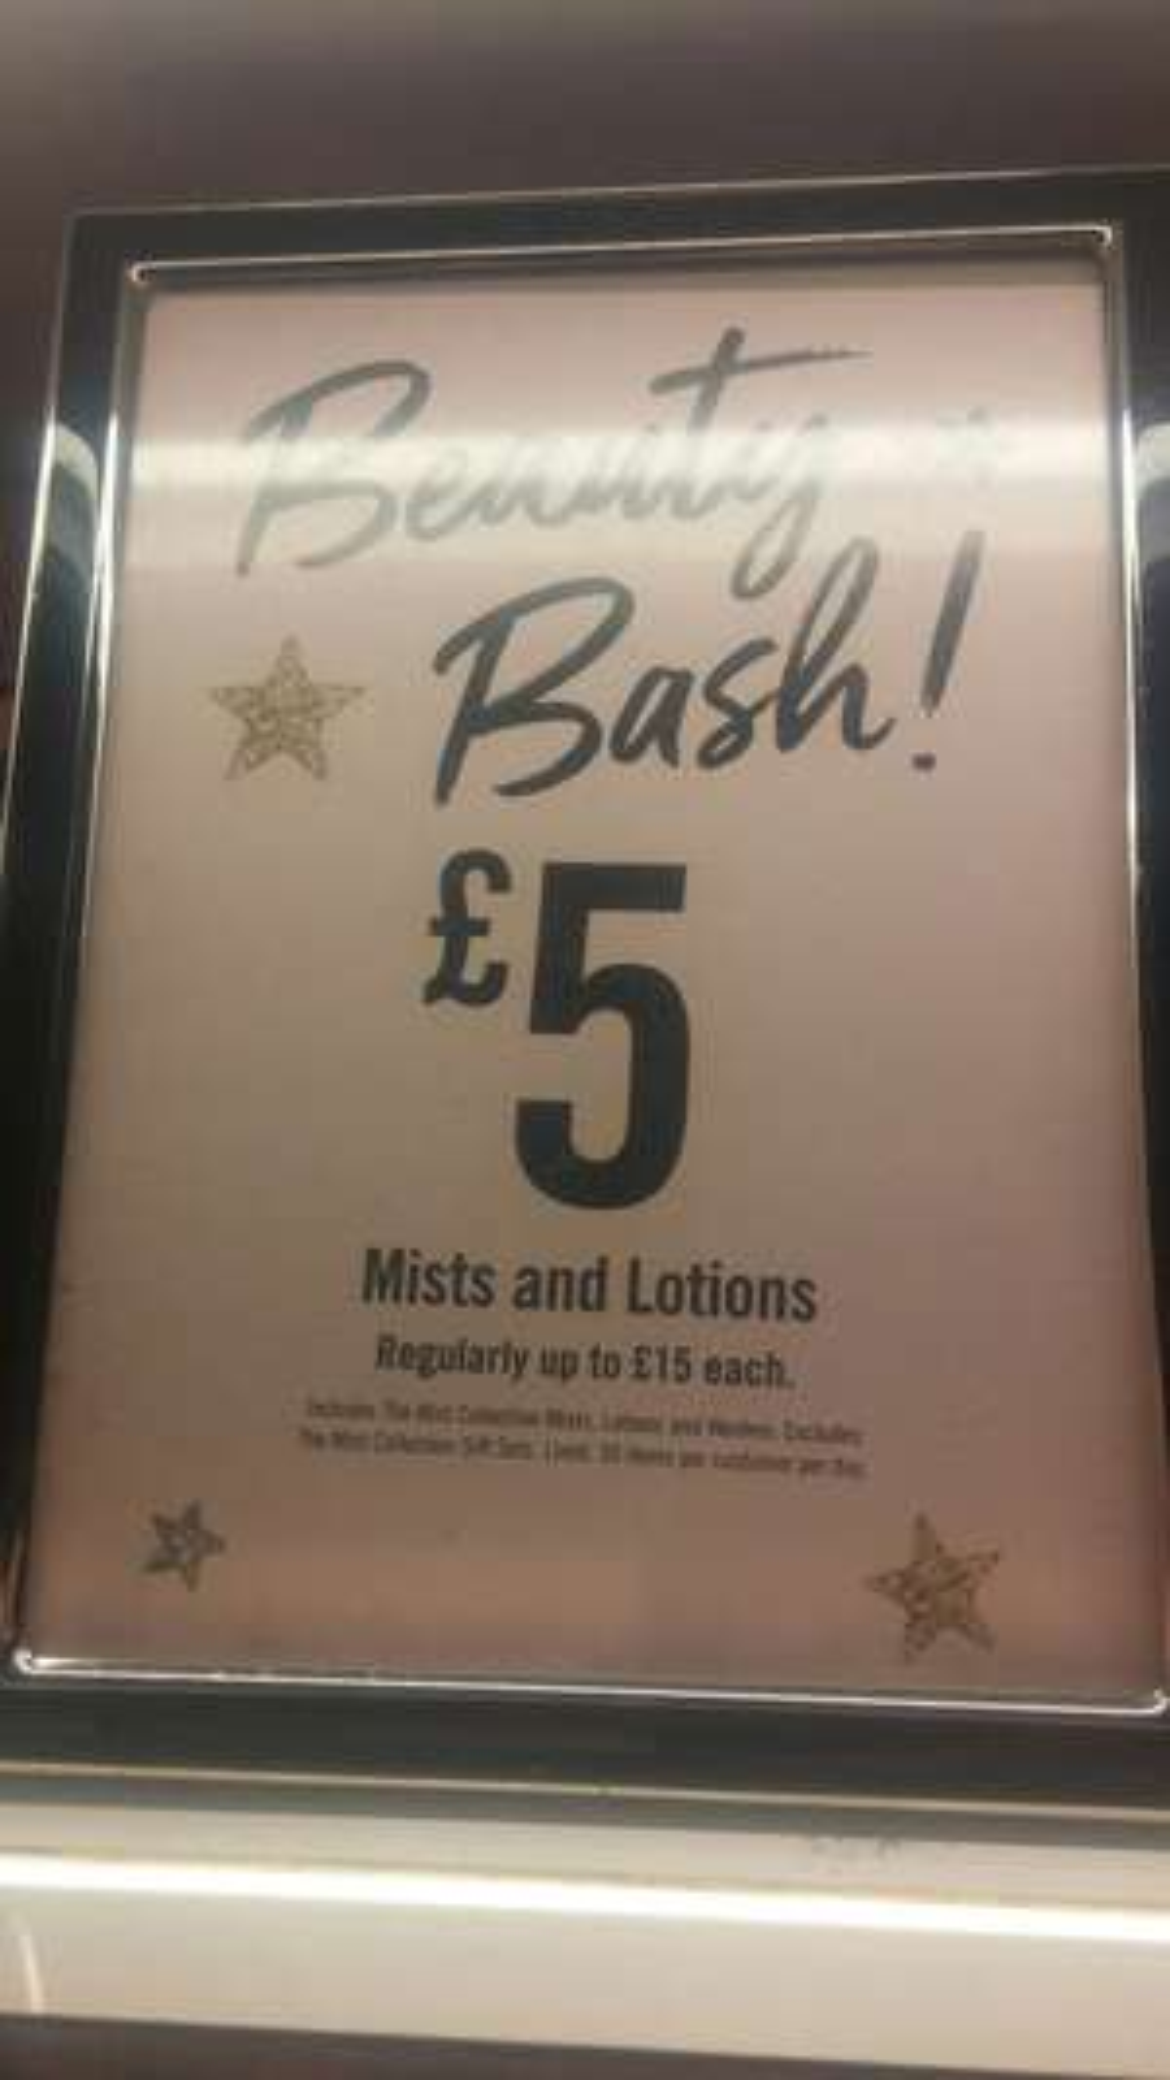 Victorias secret sprays ,body lotion & make up all reduced to £5